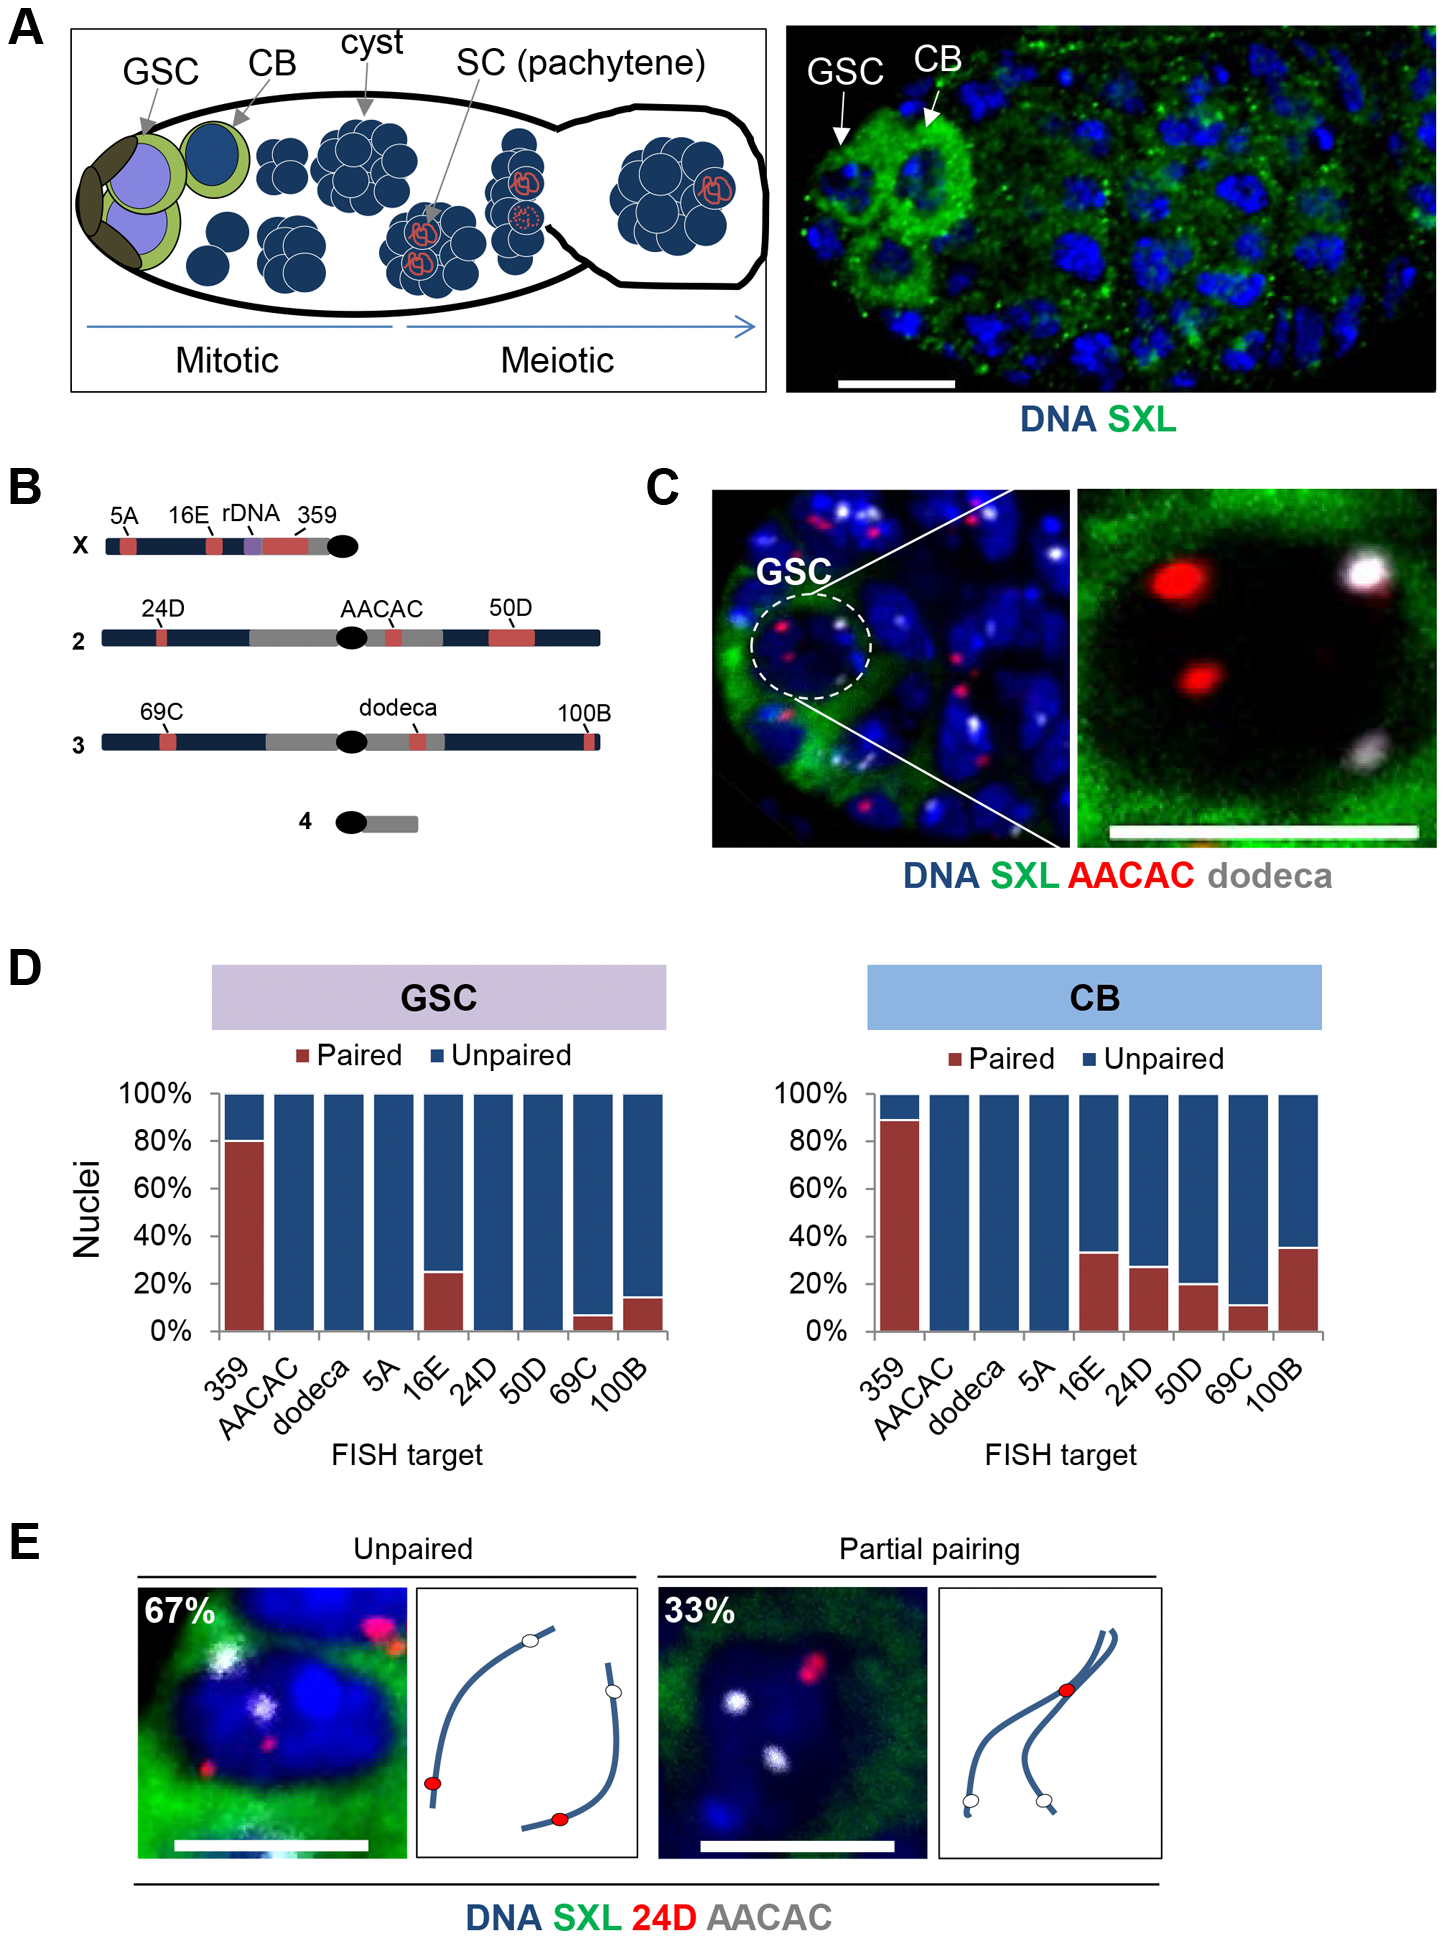 Homologous chromosomes enter the germline unpaired.